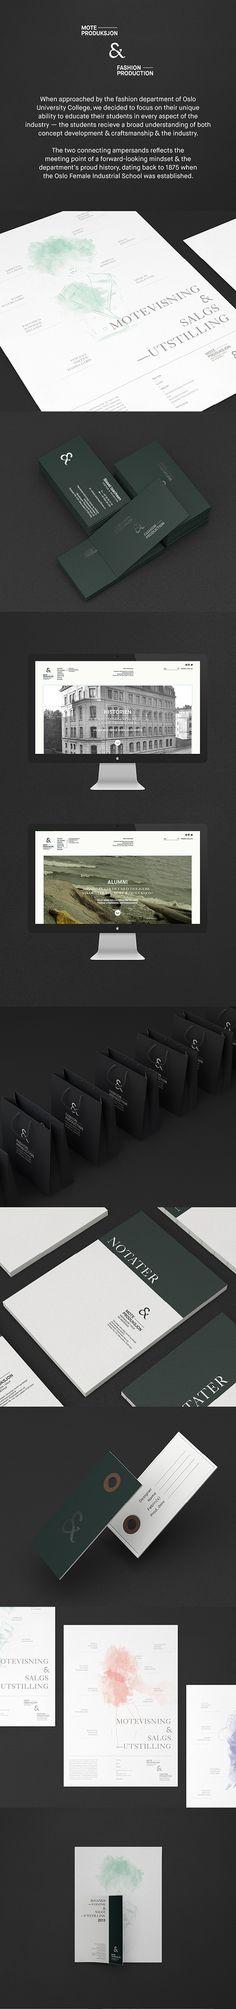 HiOA – Fashion & Production by Marius Sunde, via Behance #branding #identity